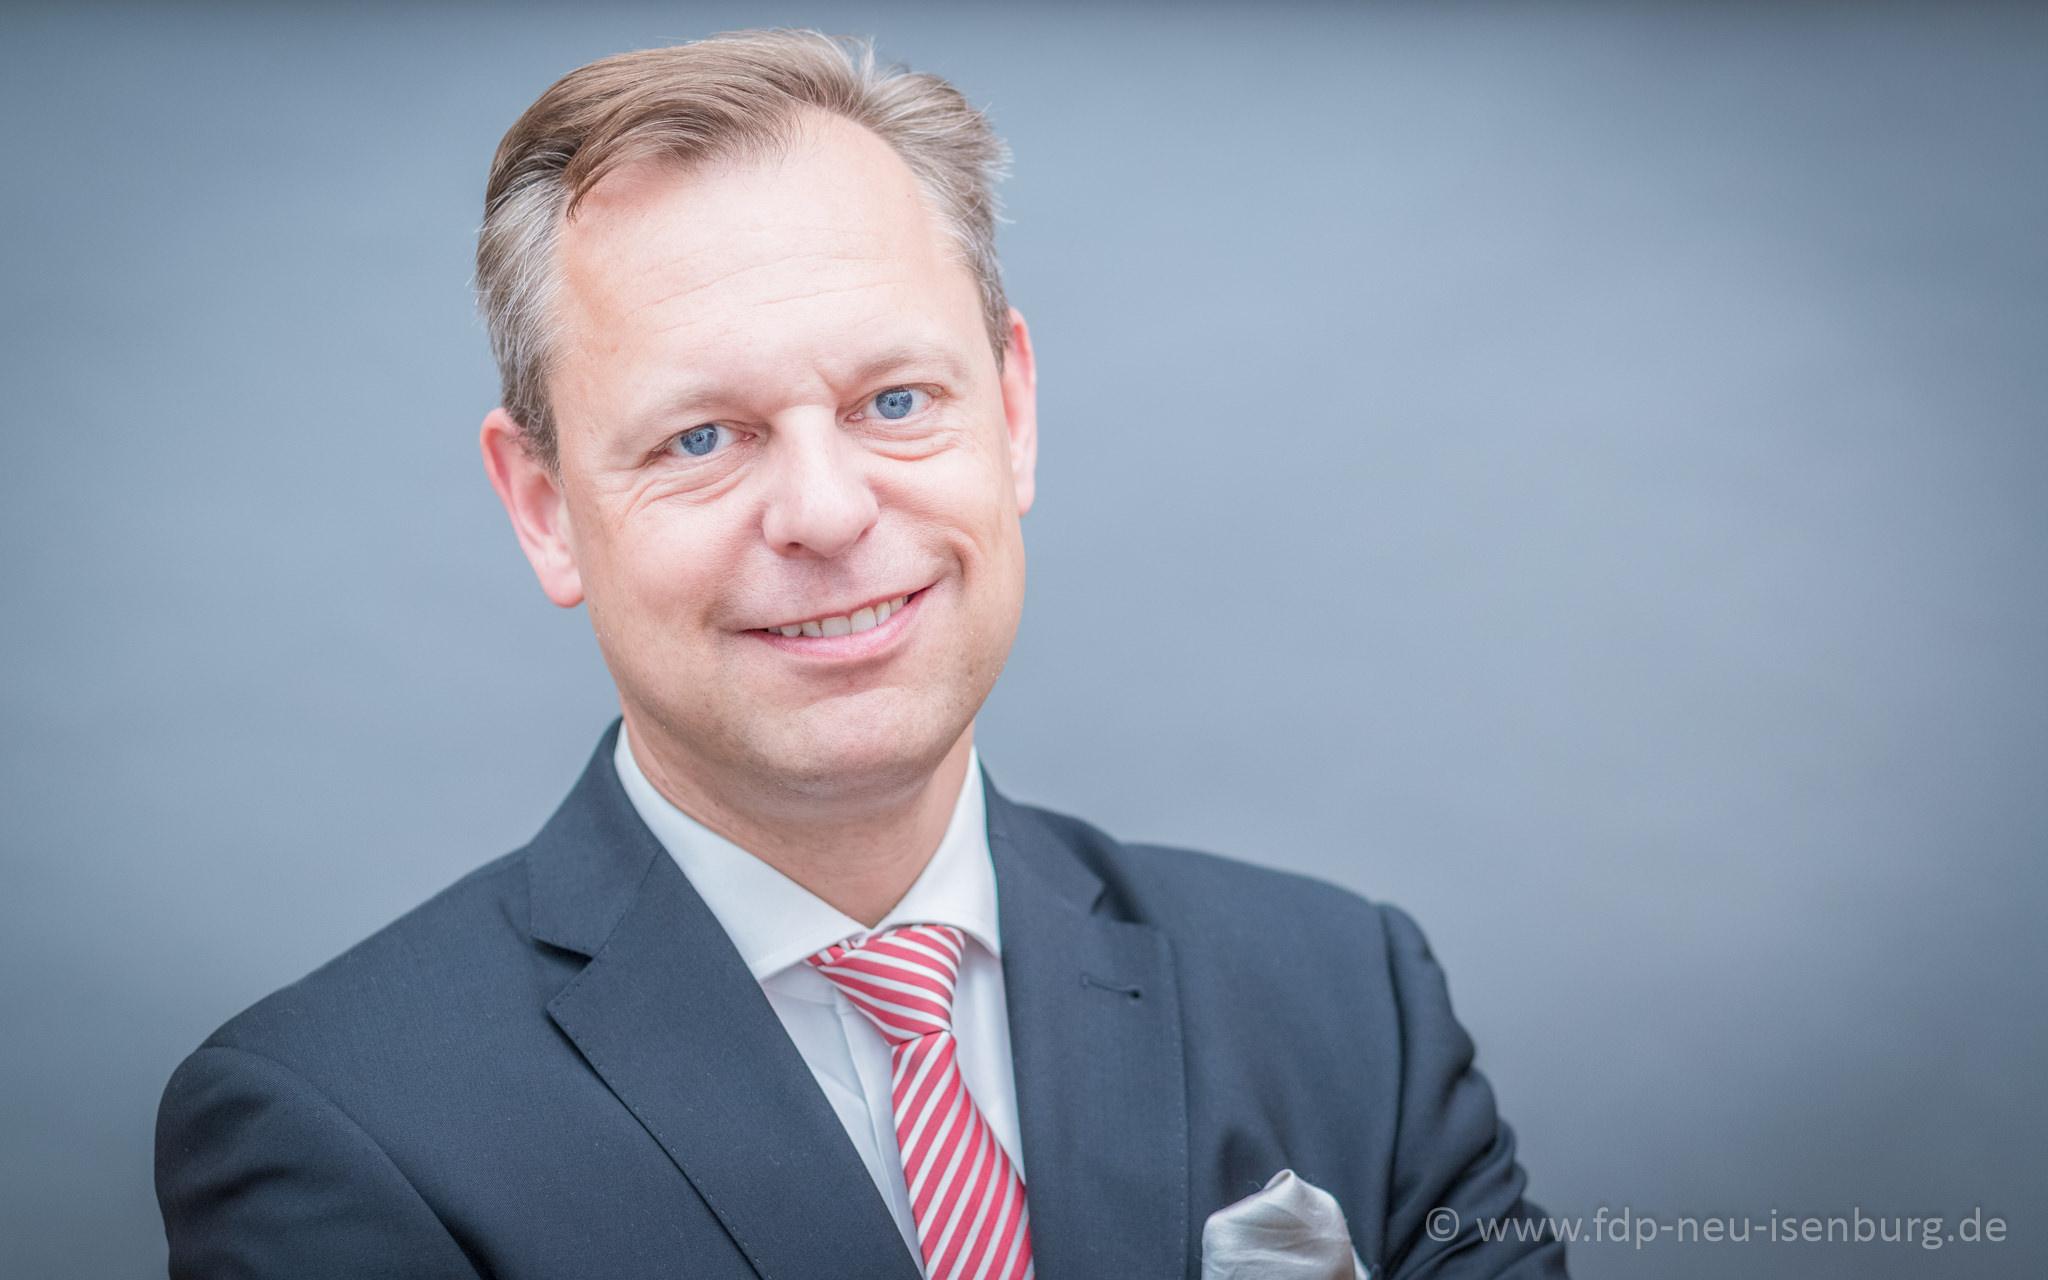 Thilo Seipel, Fraktionsvorsitzender der FDP Neu-Isenburg